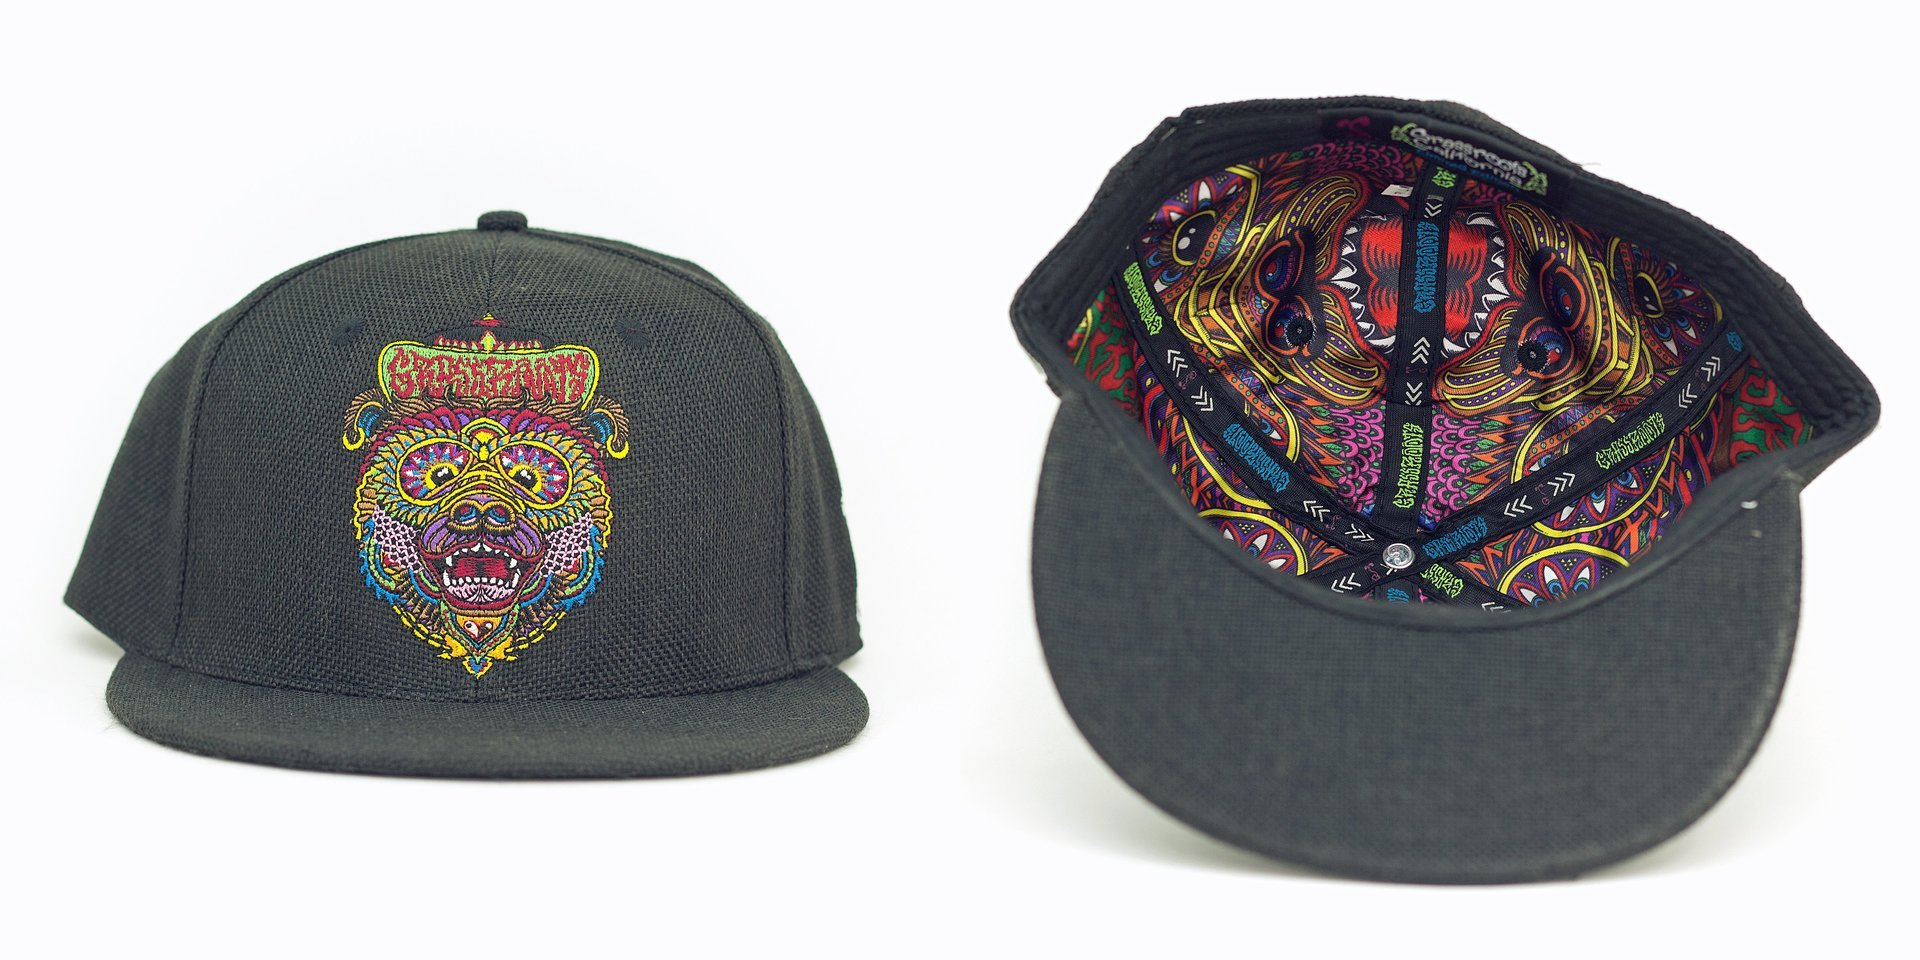 Chris Dyer OG Bear Black Hemp Fitted Grassroots California Hat